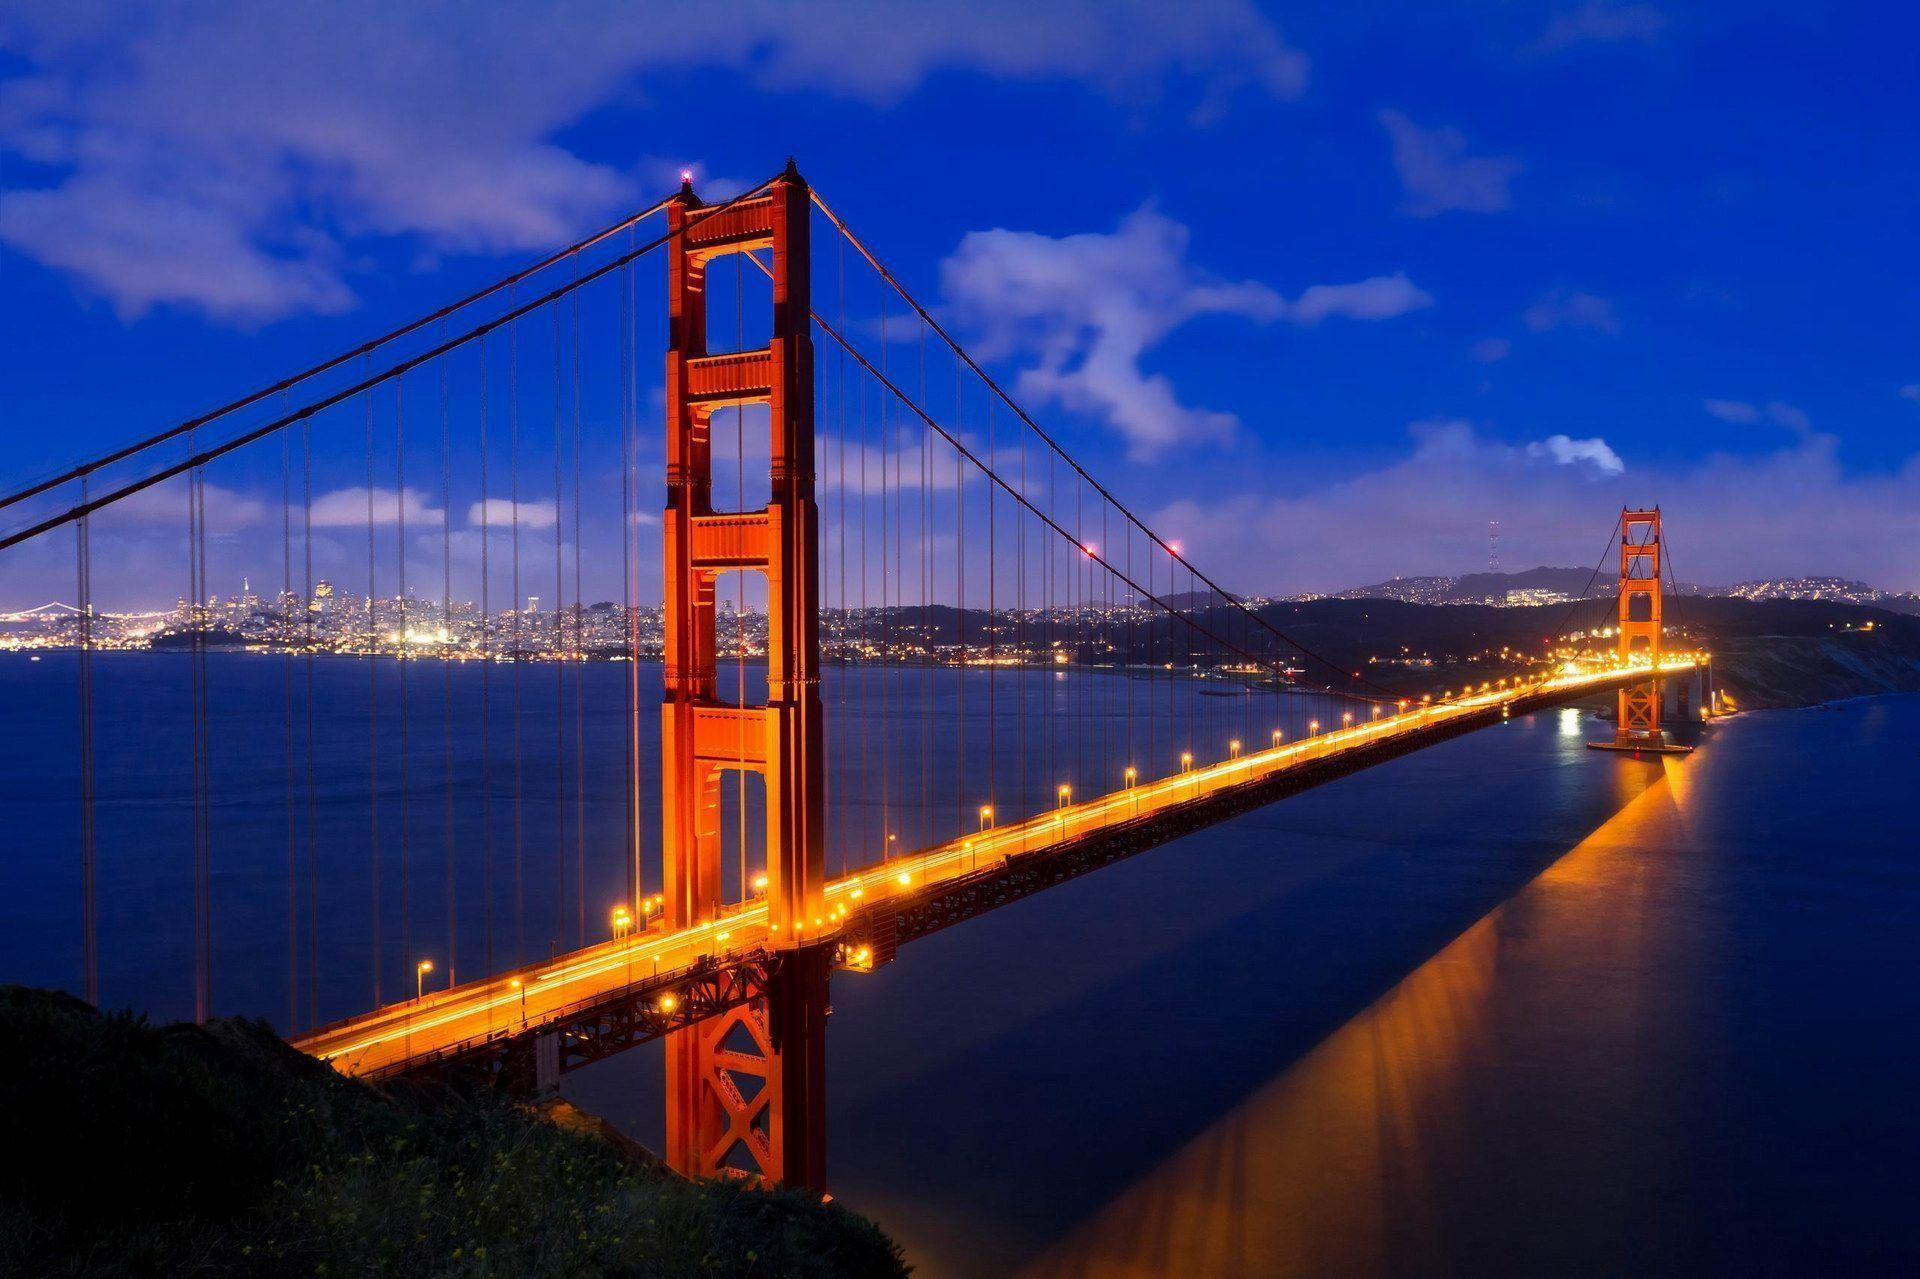 Golden Gate Bridge Wallpapers Wallpaper Cave